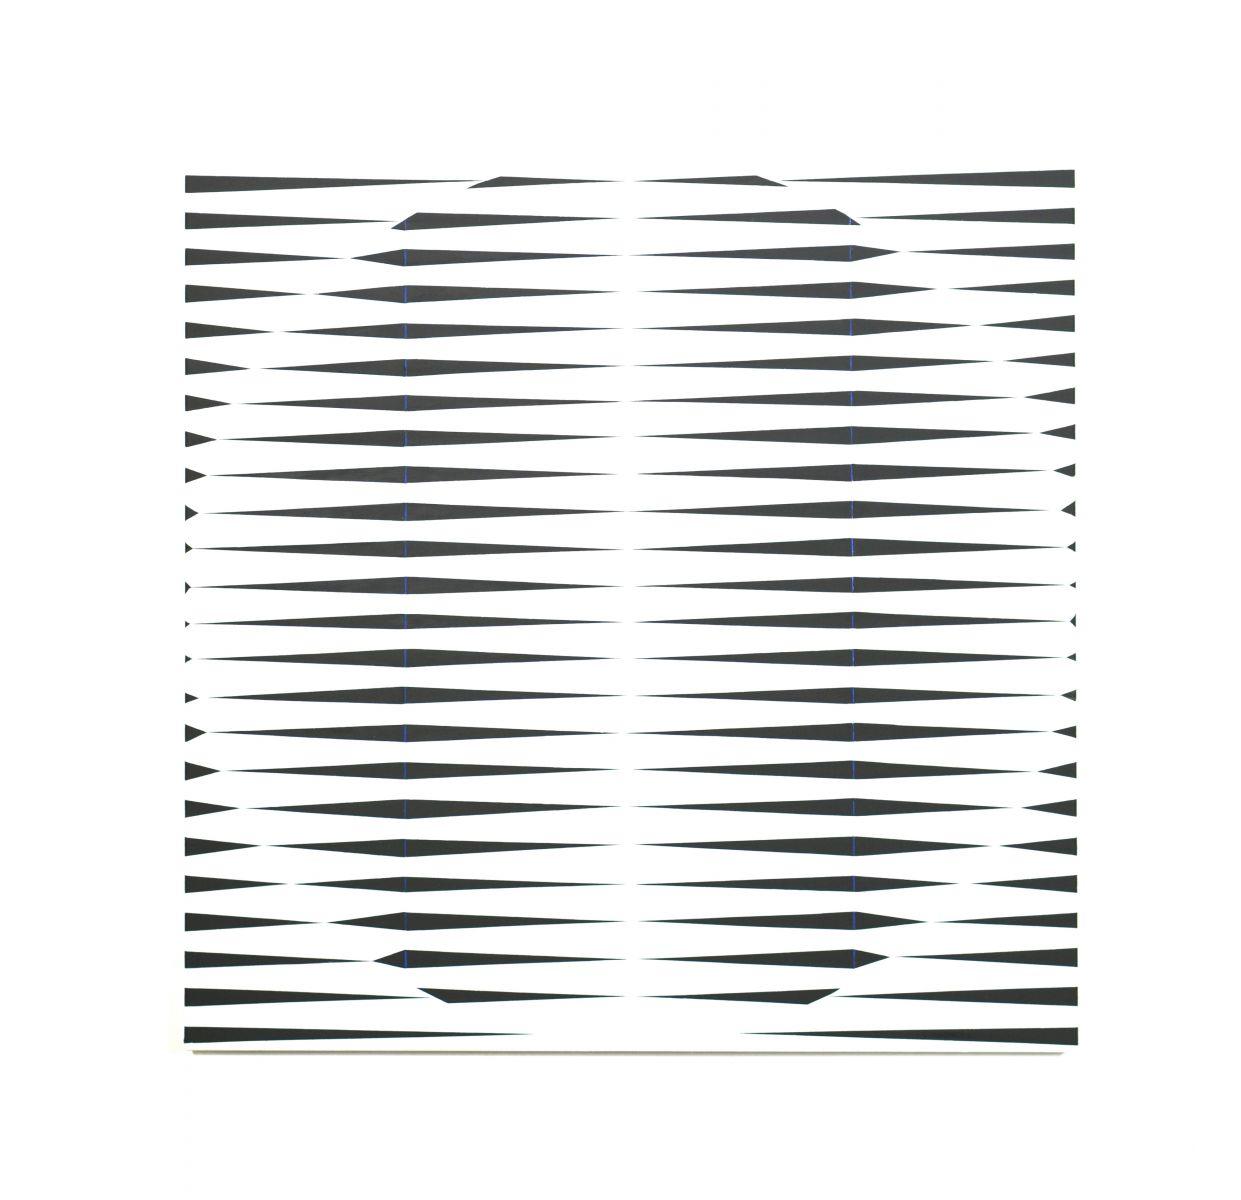 circle-artwork-black-white